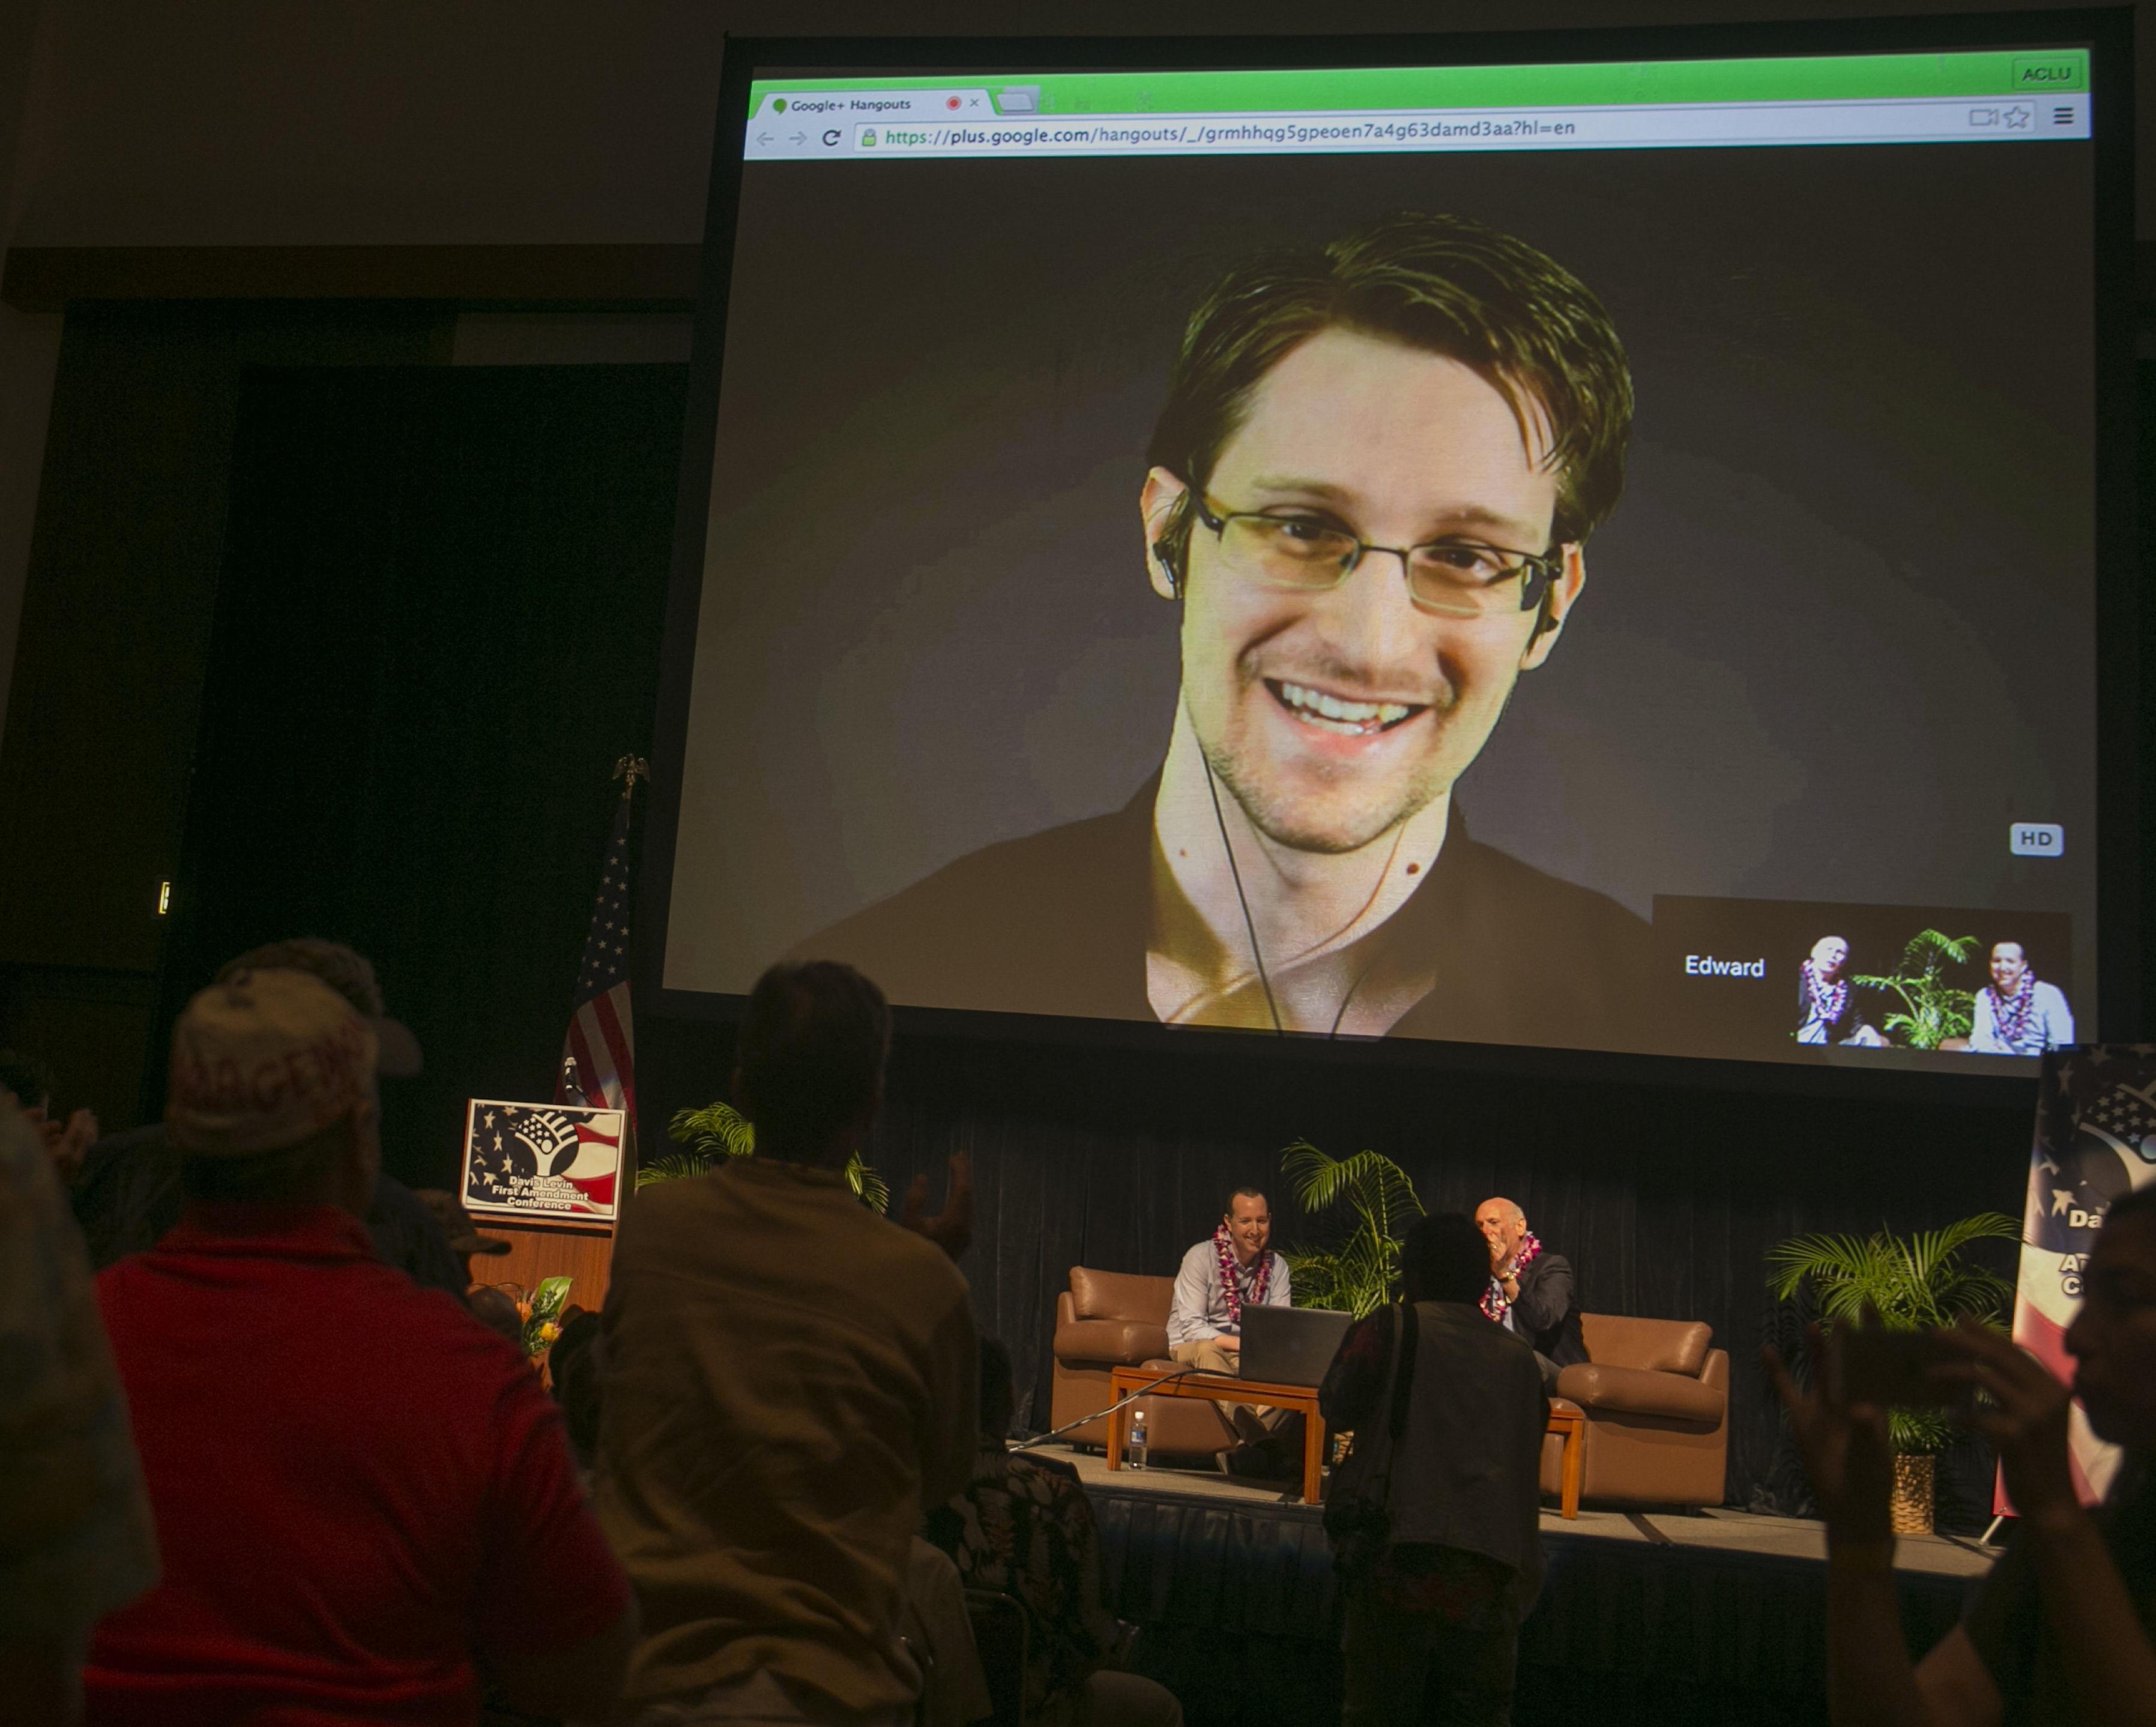 Edward Snowden em videoconferência de Moscou